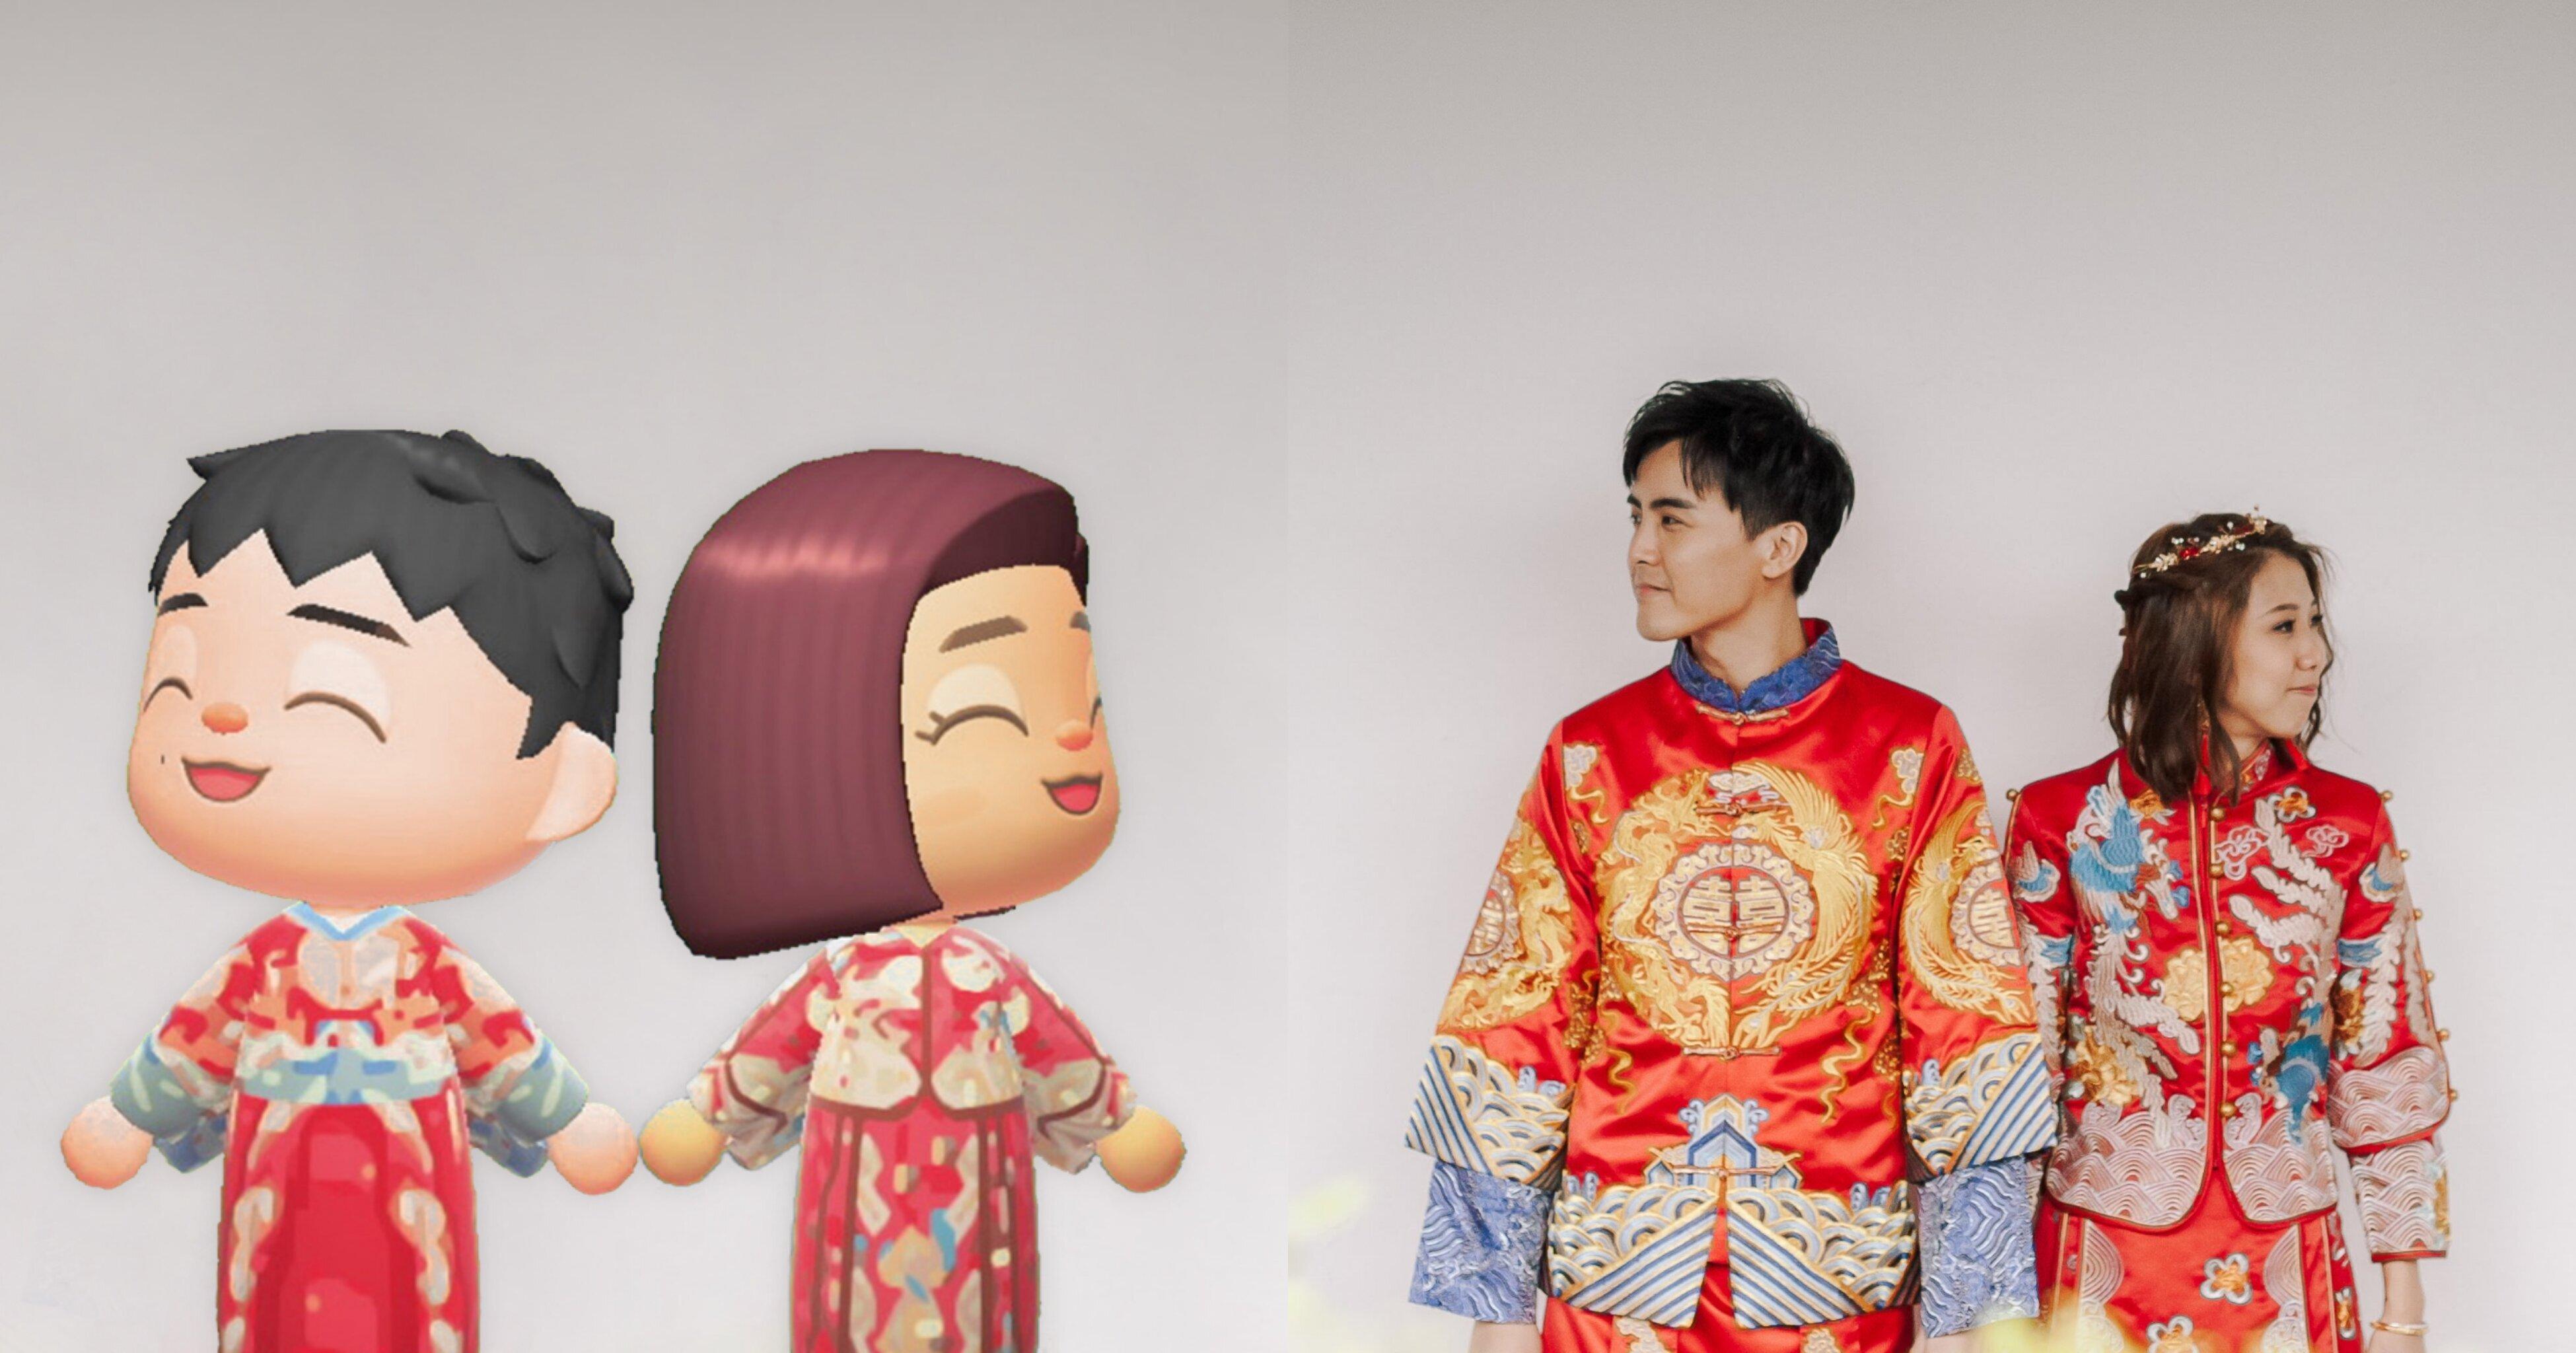 Derrick Hoh Goes Digital: Animal Crossing Wedding & 1st Online Performance